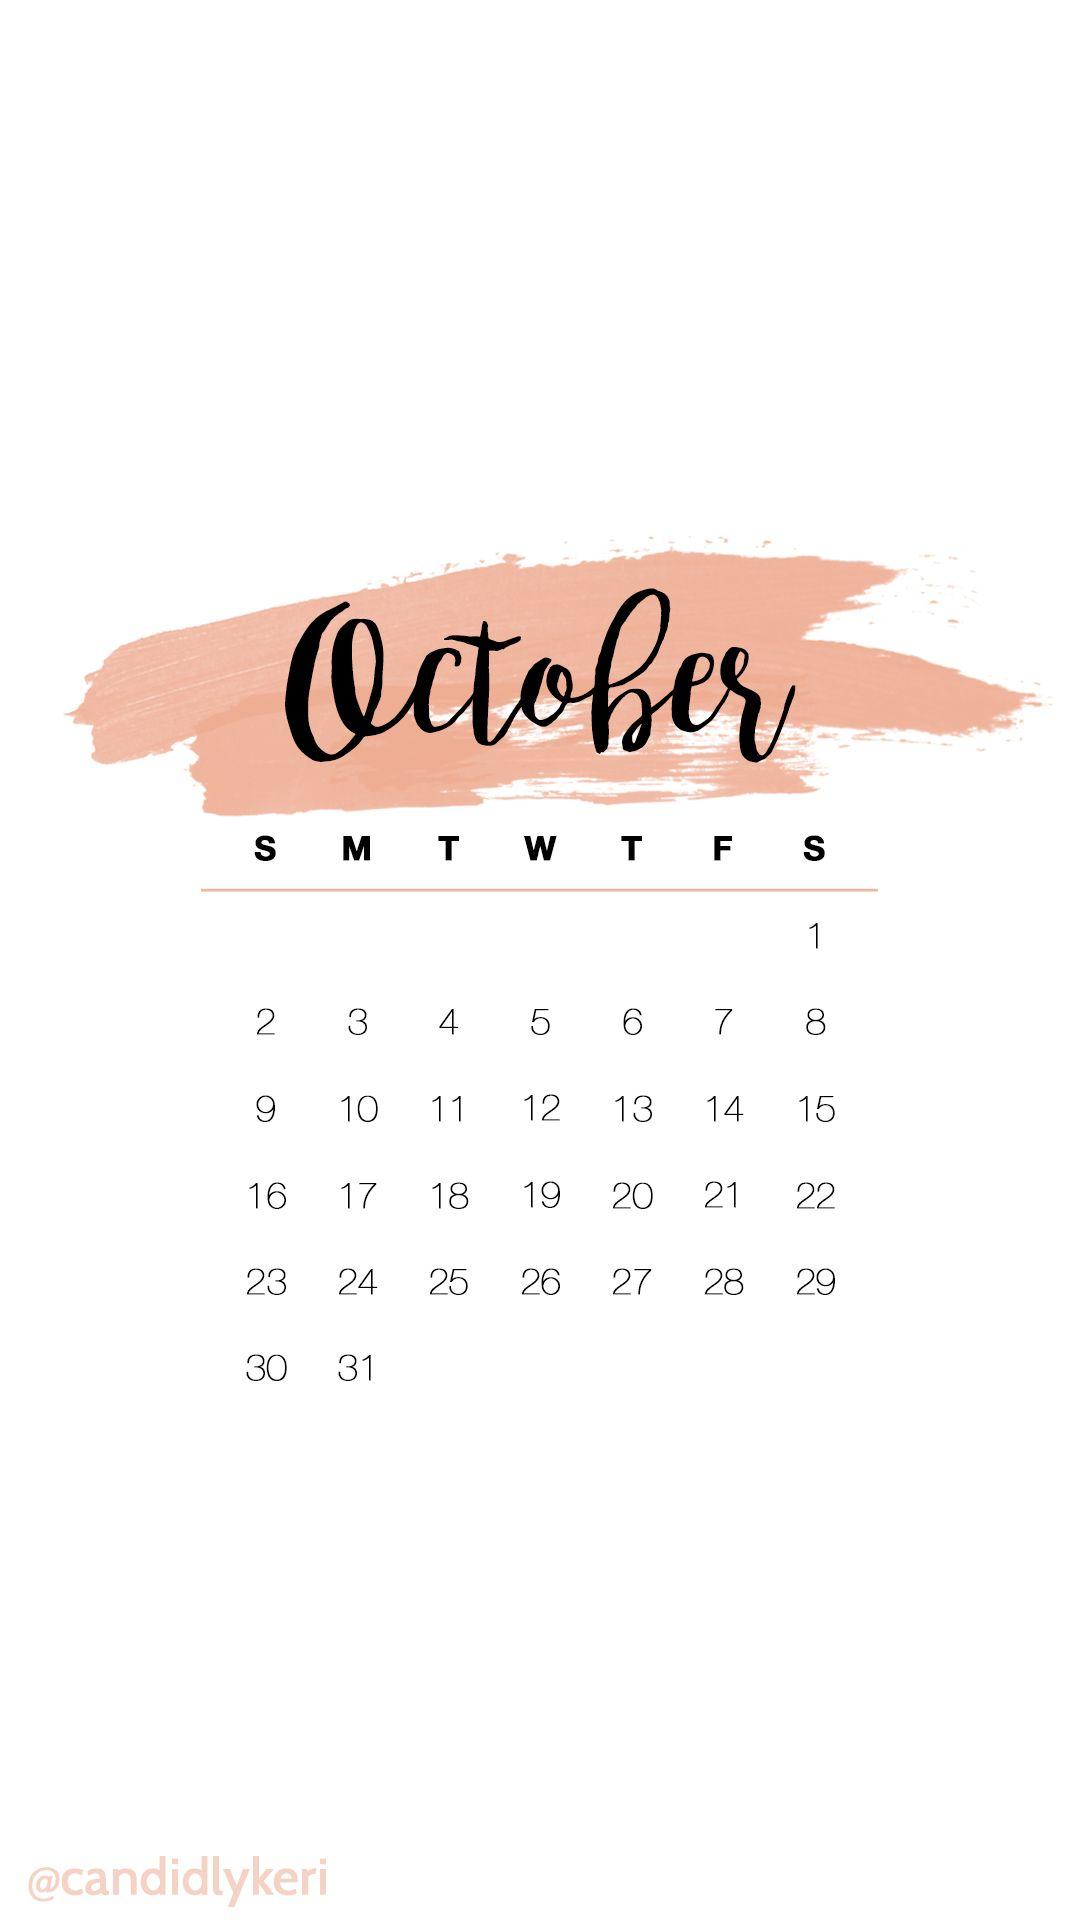 October Calendar Wallpaper Iphone : Cute pink watercolor october calendar wallpaper you